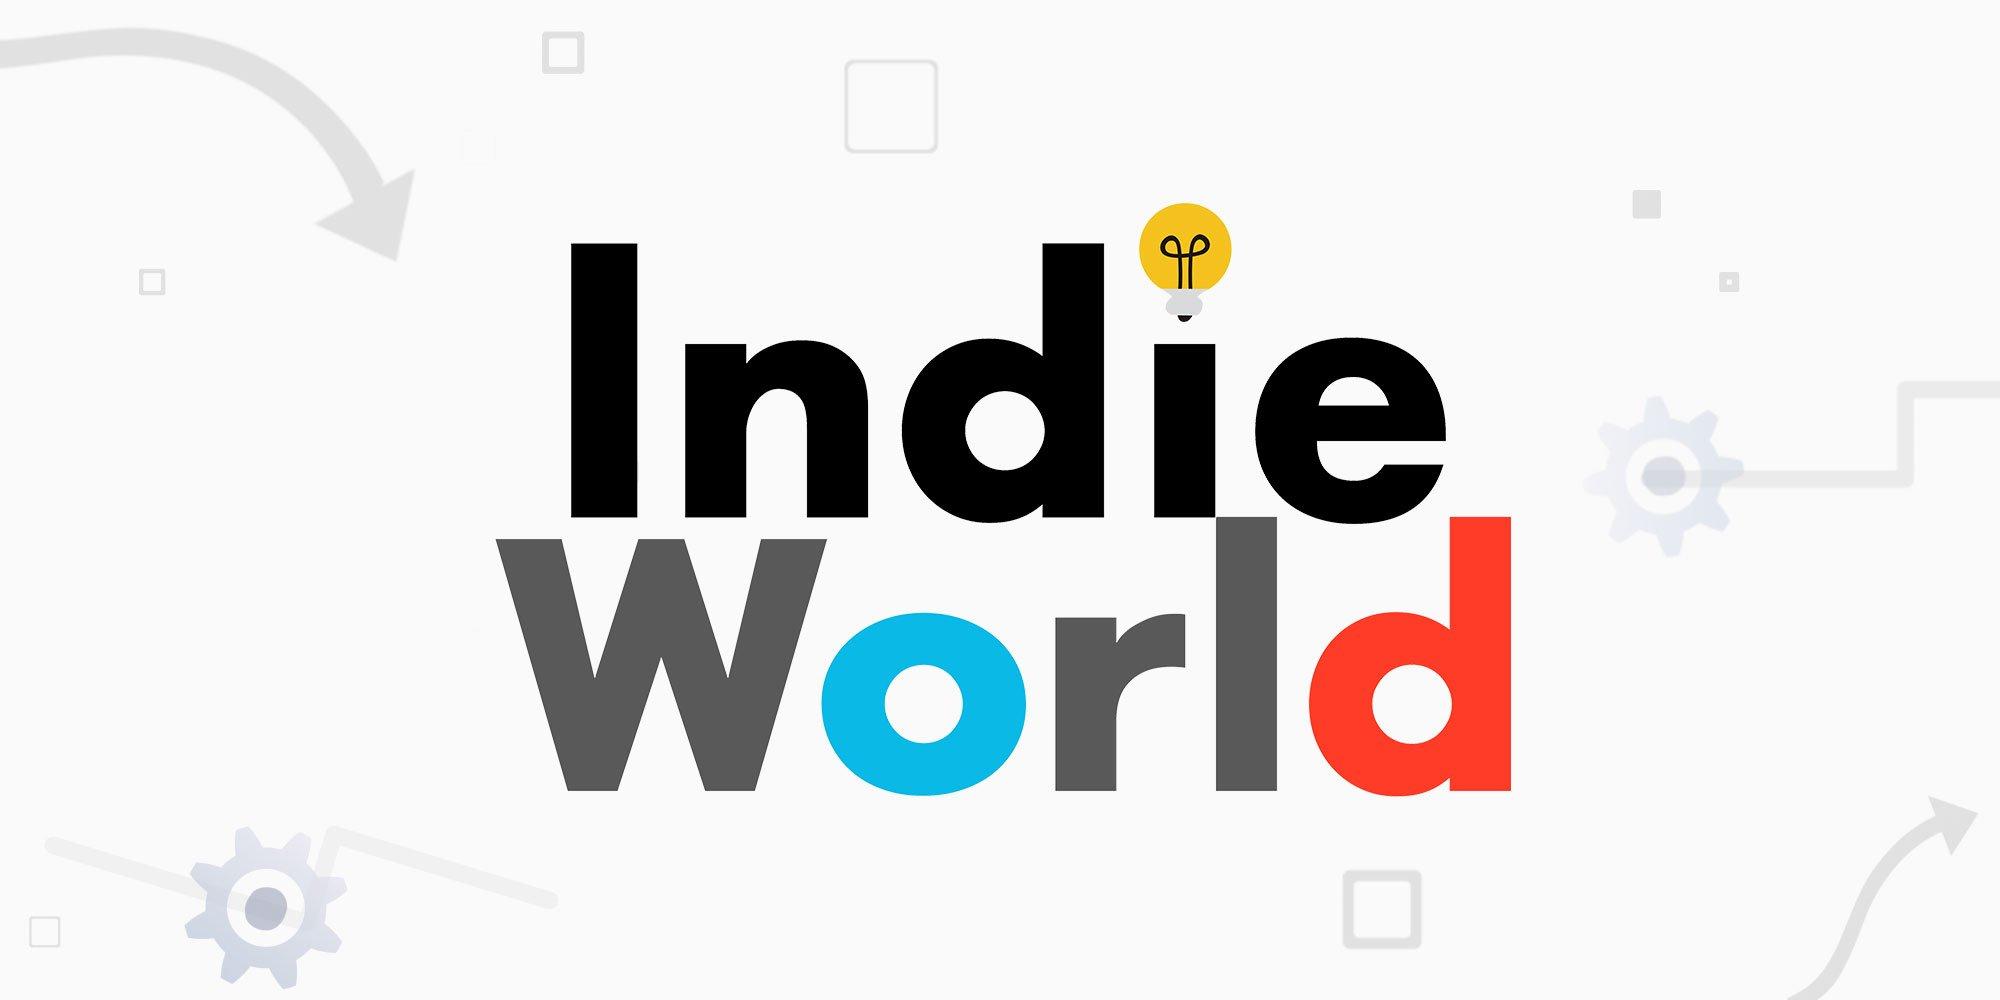 Indi games